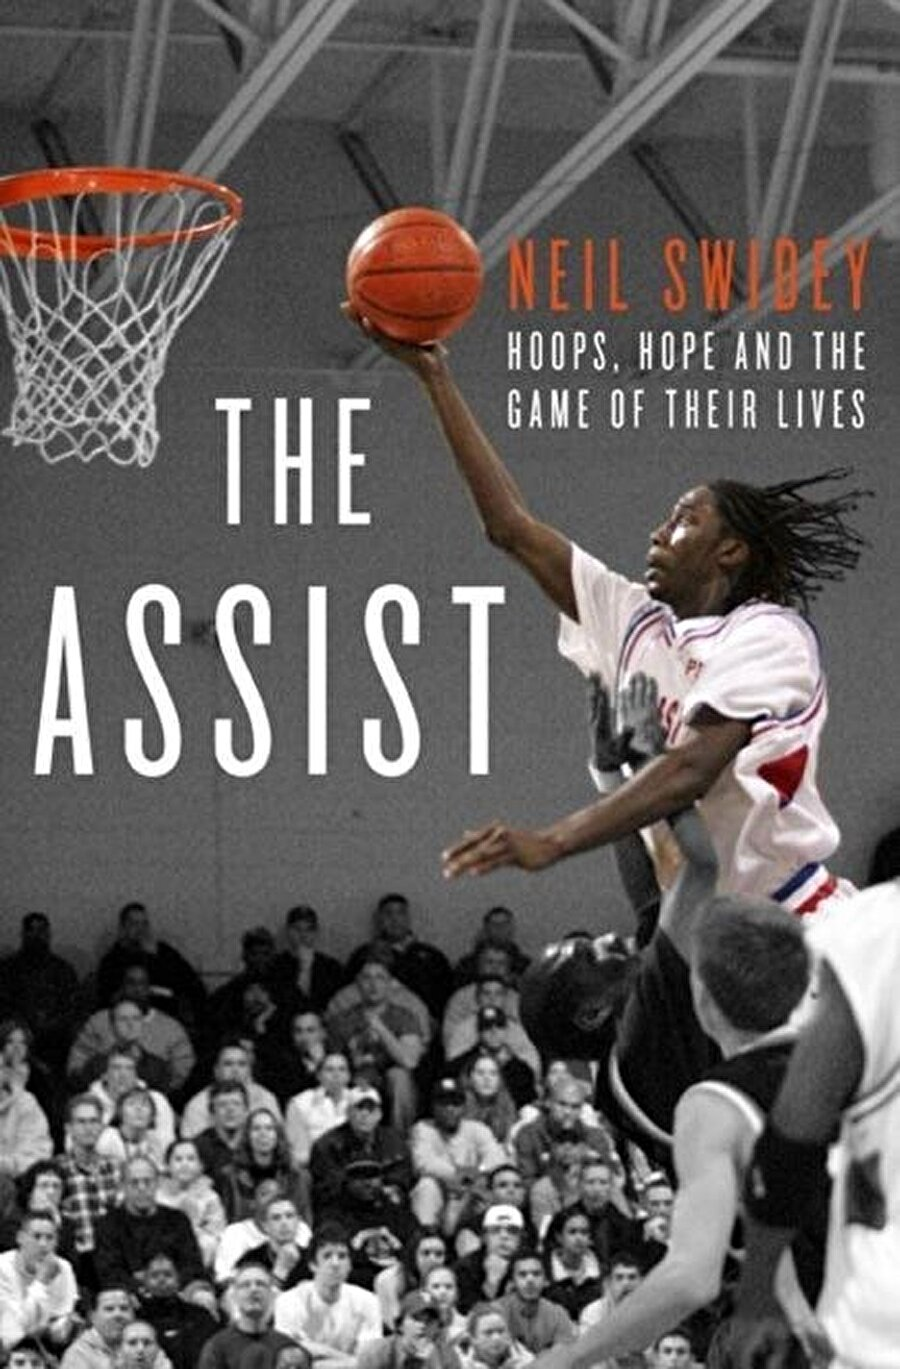 THE ASSIST: Neil Swidey